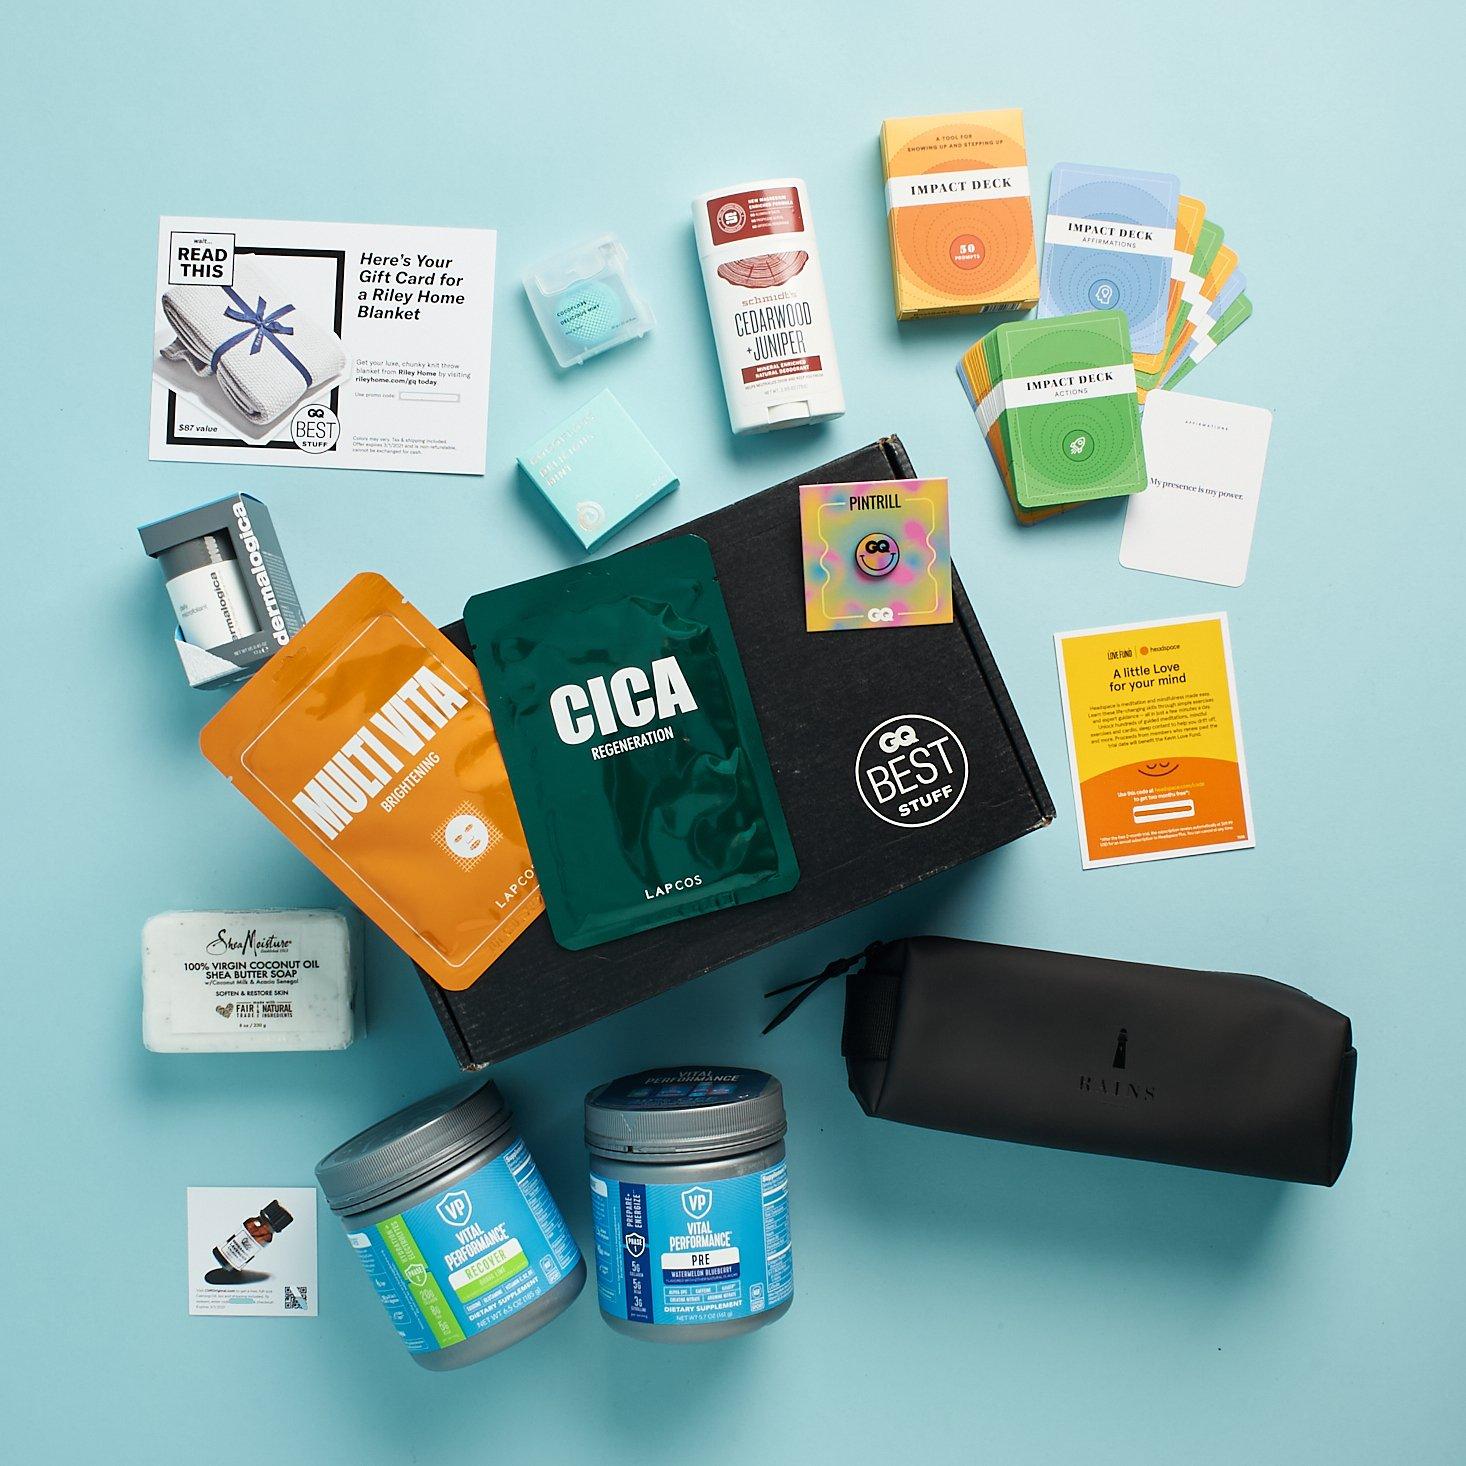 GQ Best Stuff Box Subscription Box Review – Winter 2020